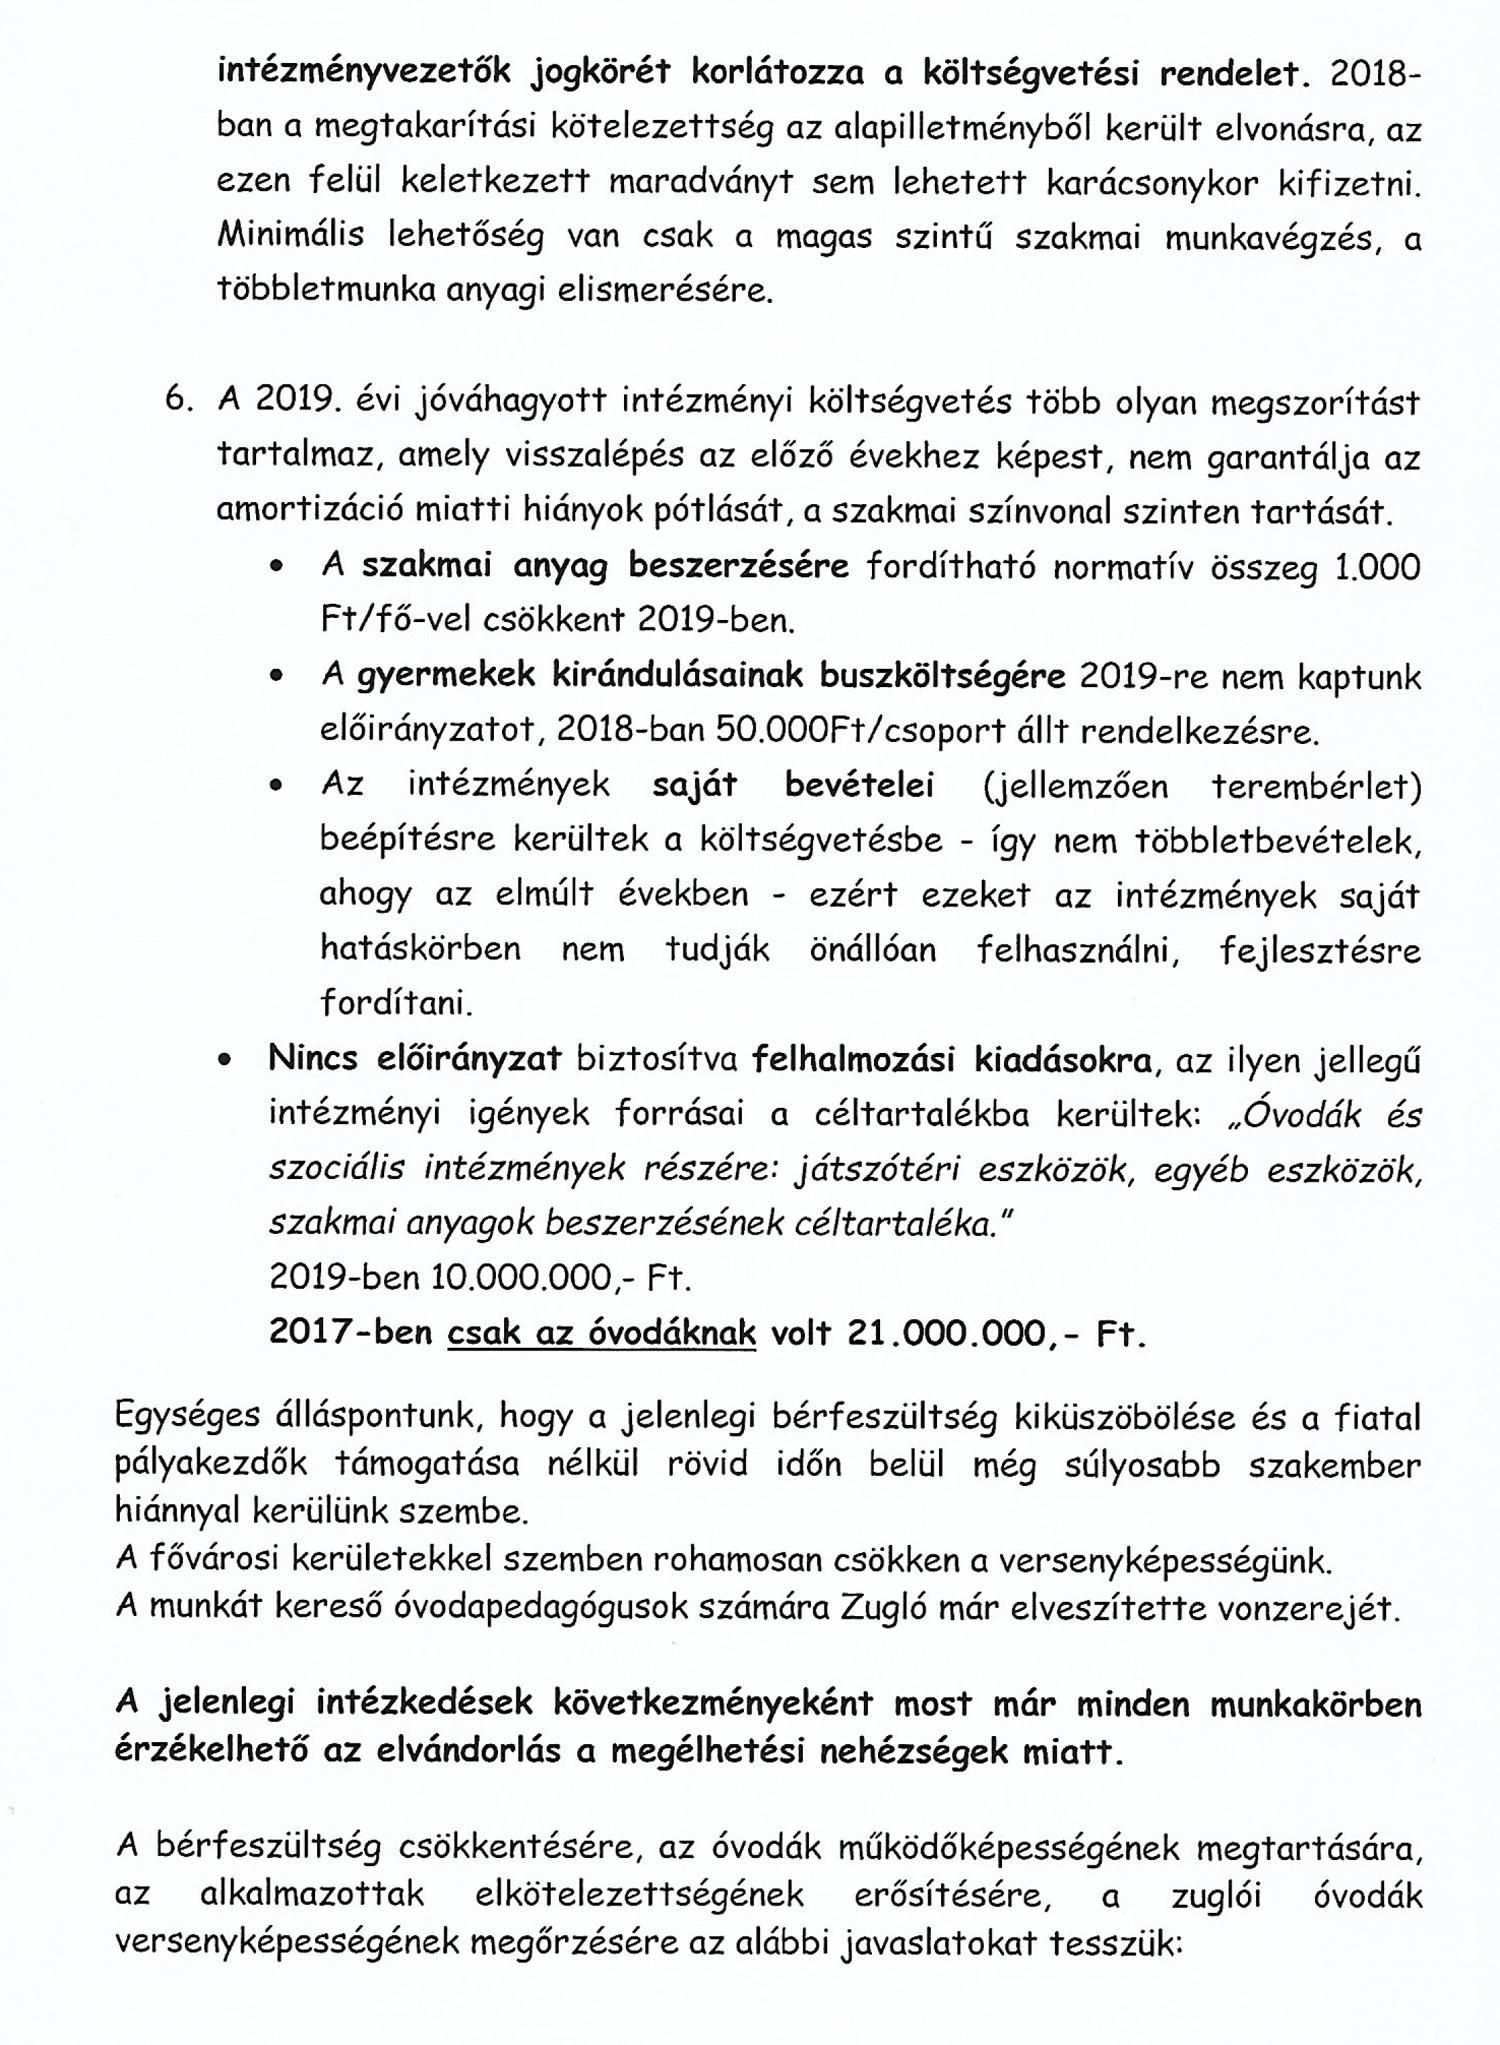 kepviselo-testuleti_level_zugloi_ovodak_20190227-3.jpg